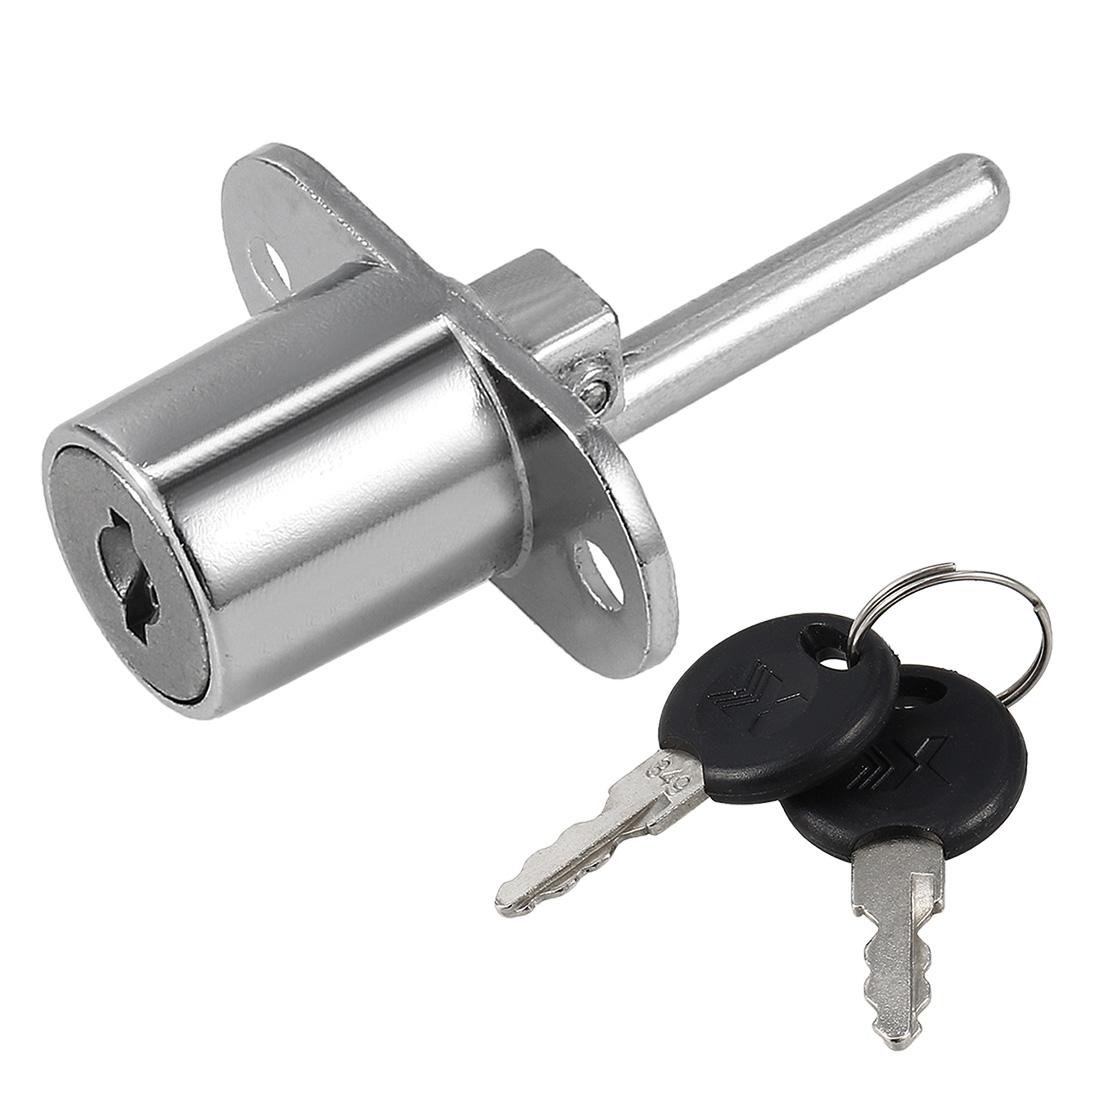 Drawer Lock, 3/4-inch(19mm) Diameter 20mm Long Cylinder, Keyed Different